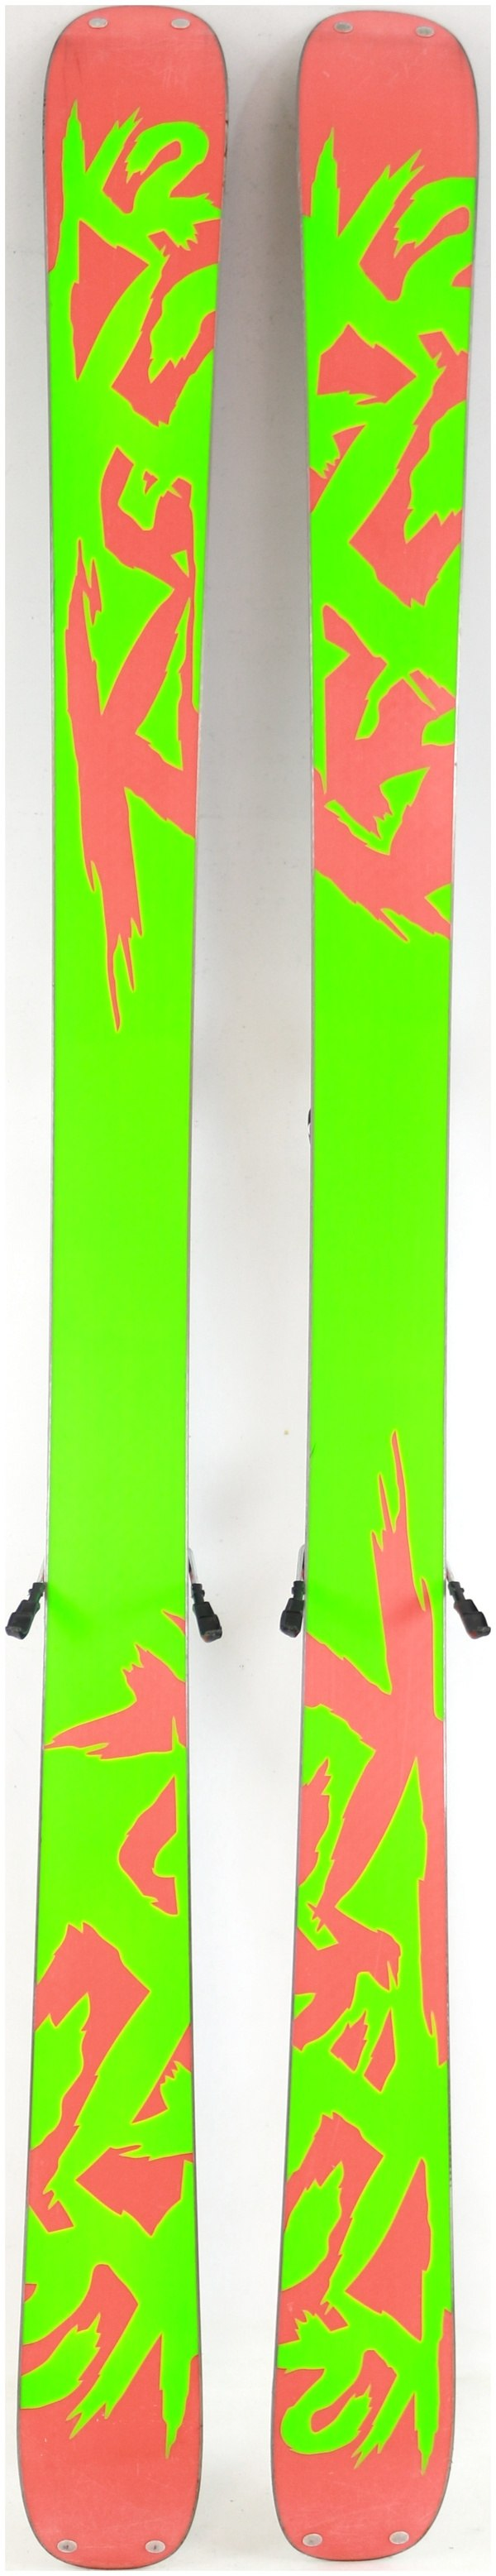 2014 K2 Recoil 169cm Used Demo Skis On Sale Powder7